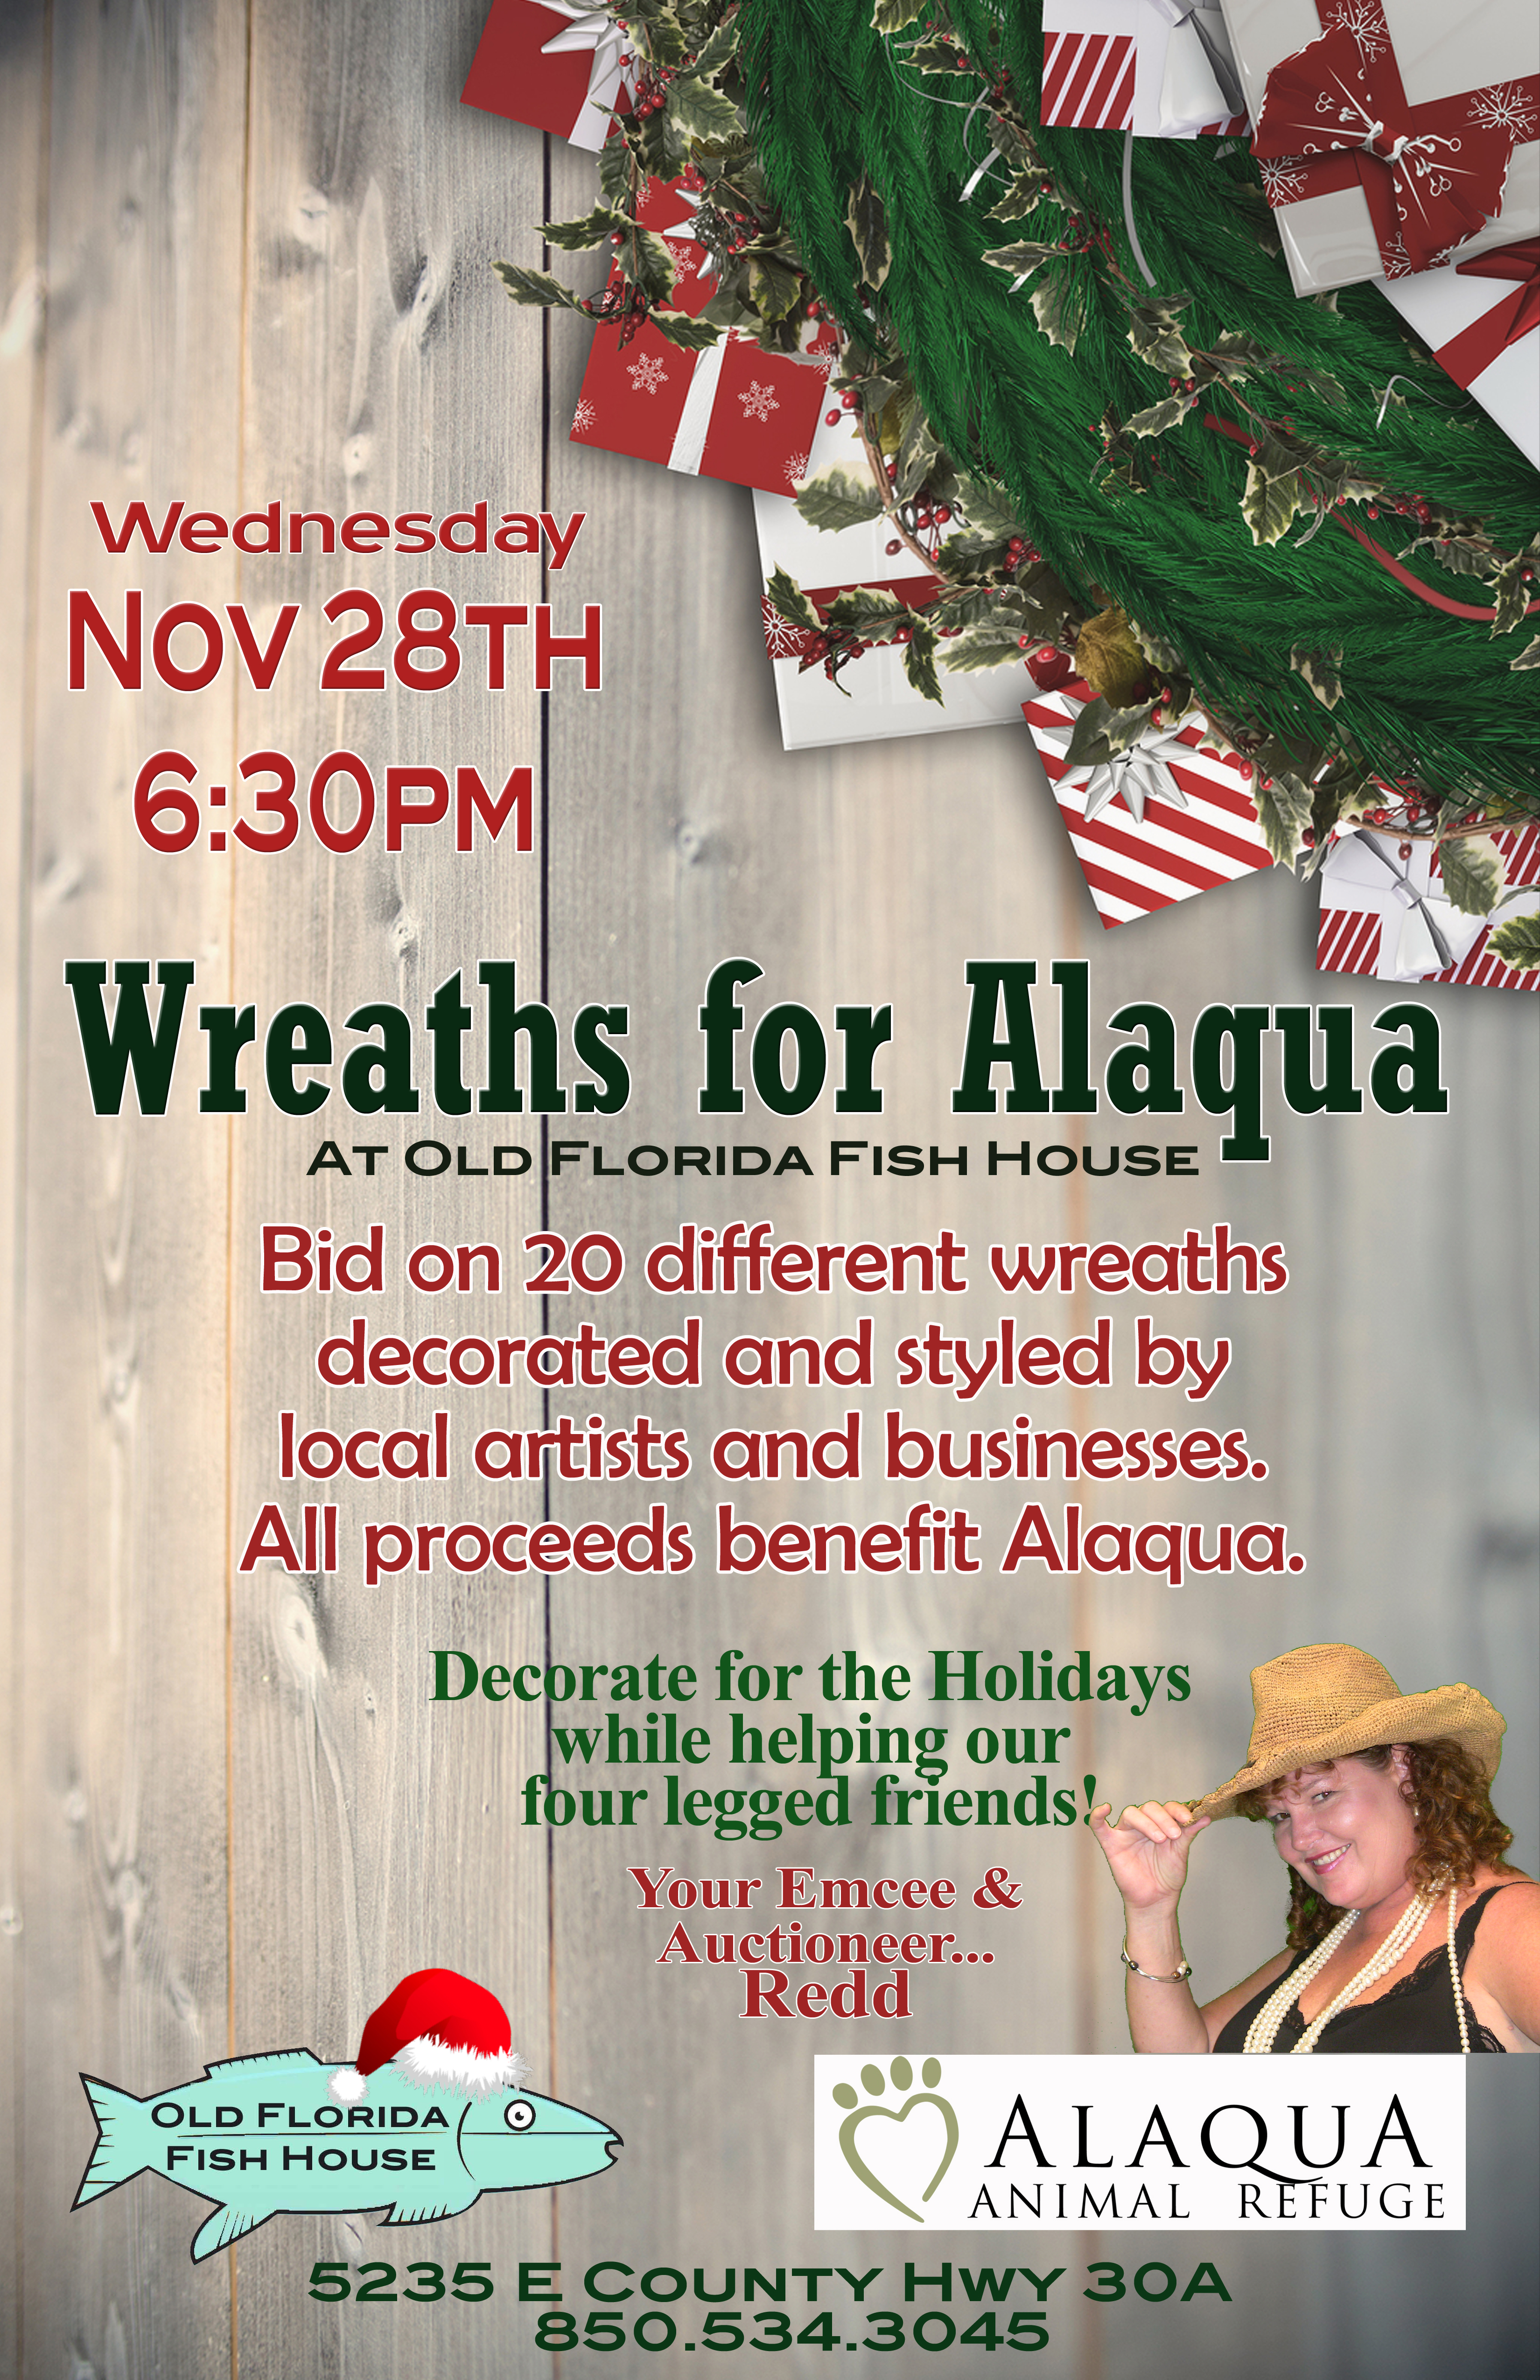 Old Florida Fish House Announces Fifth Annual Wreaths for Alaqua